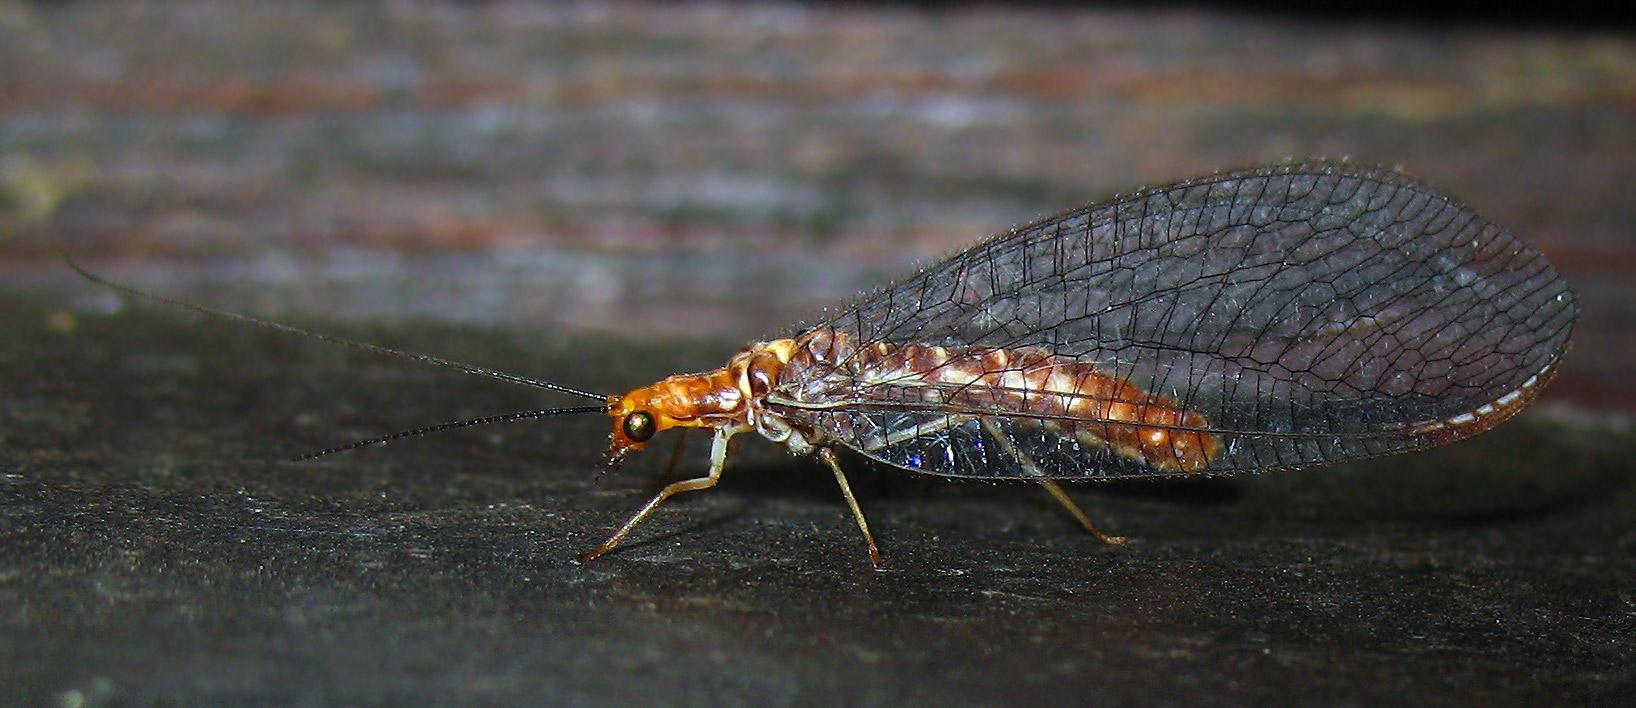 Nothochrysa capitata